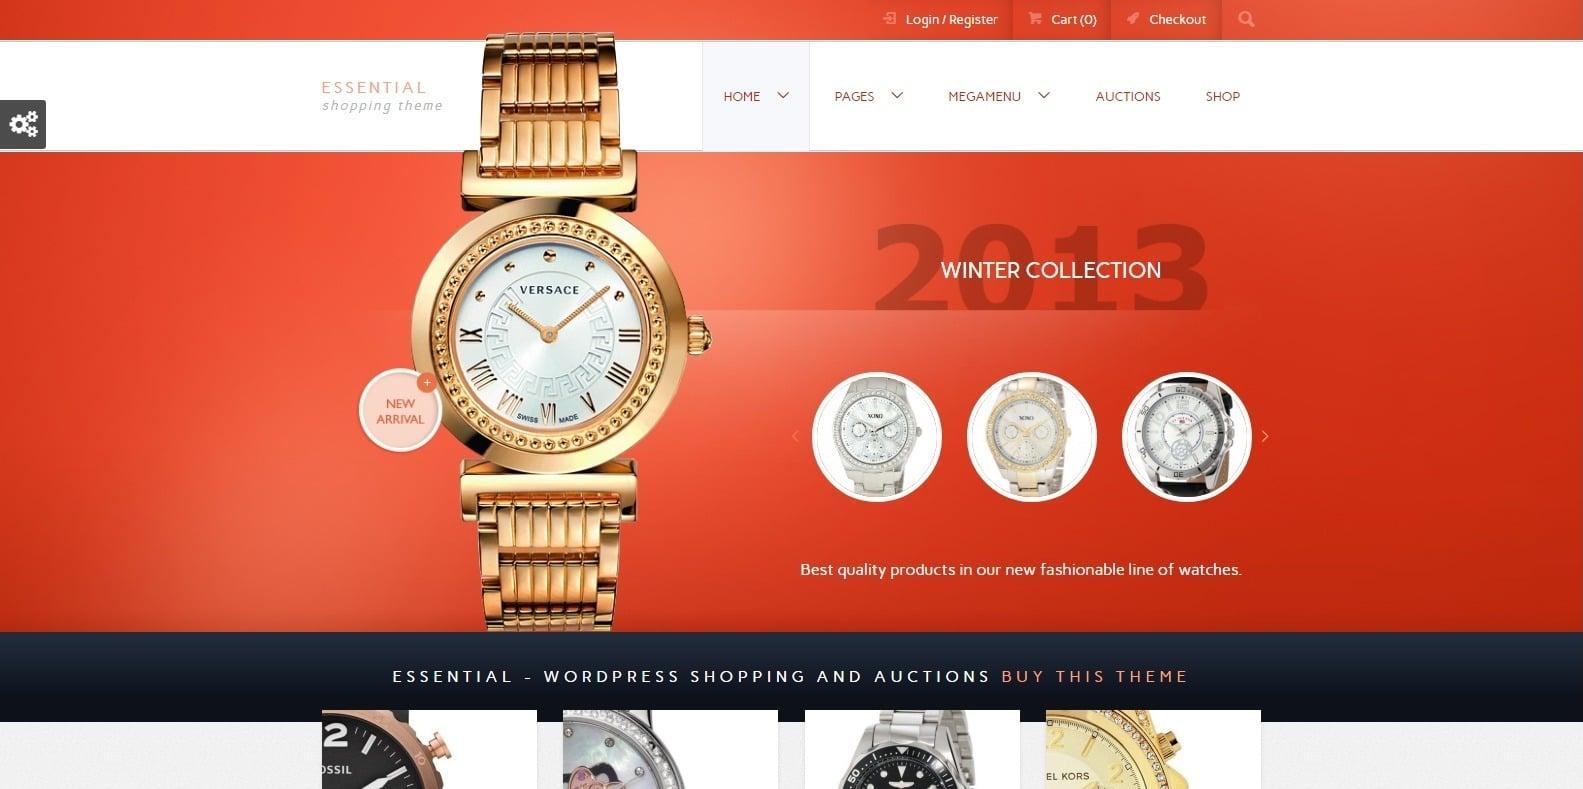 essential-auction-website-templates-wordpress